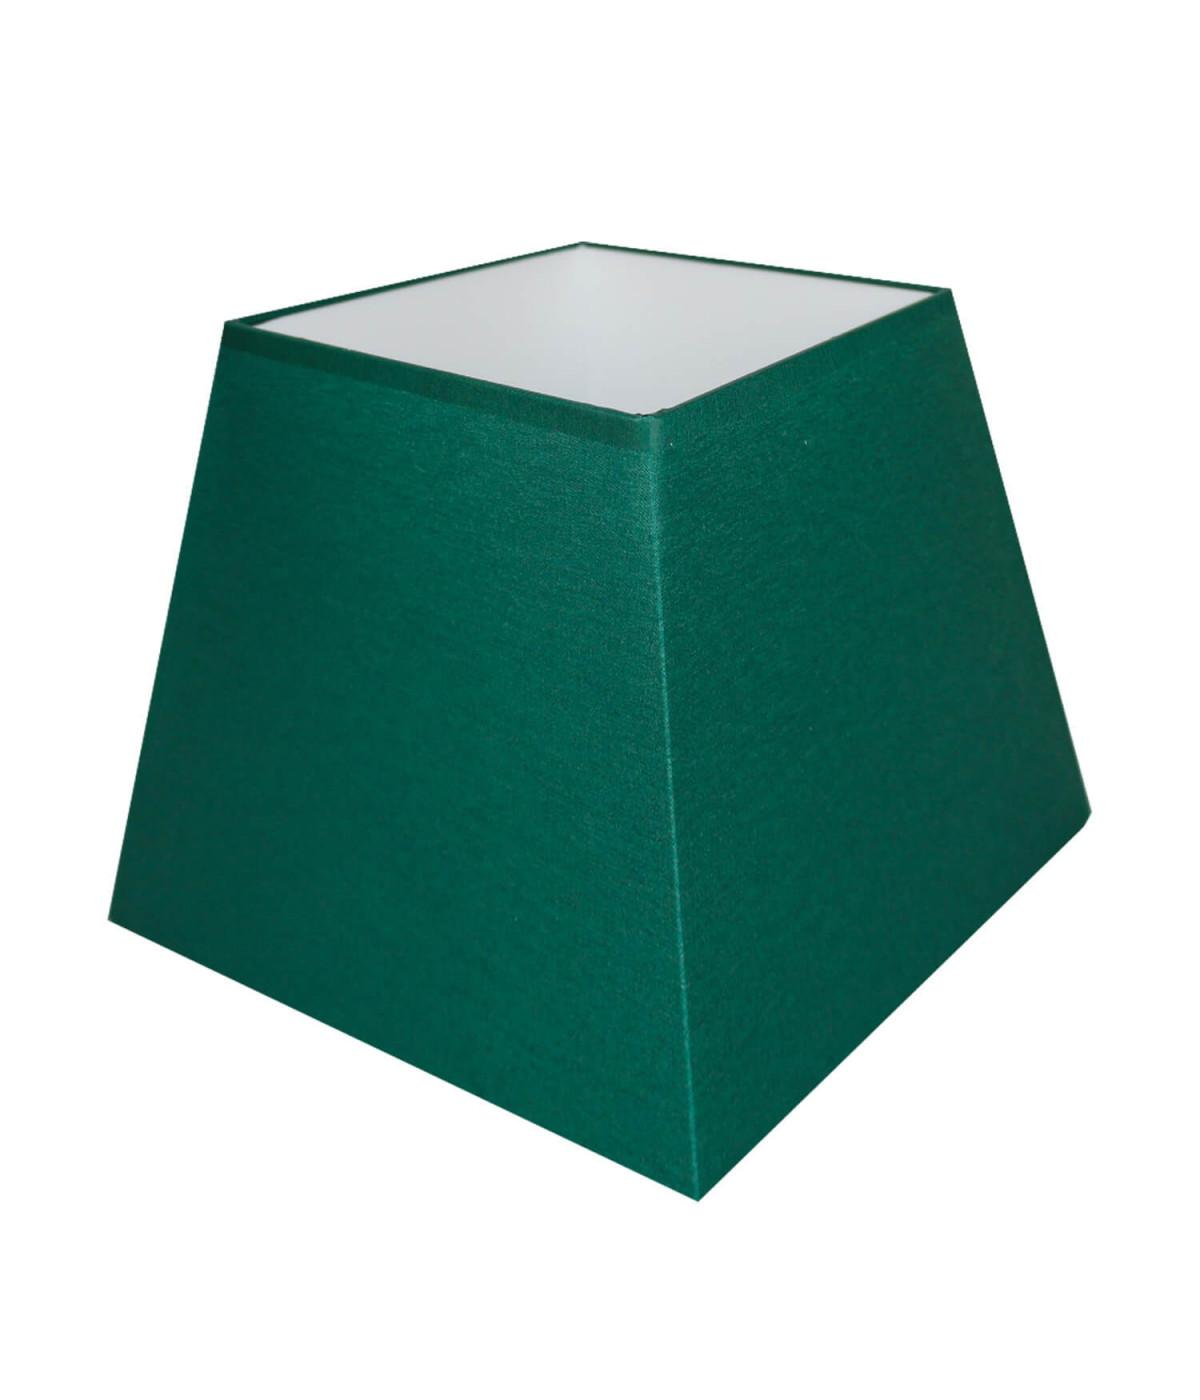 Abat-jour carre pyramidal Vert empire